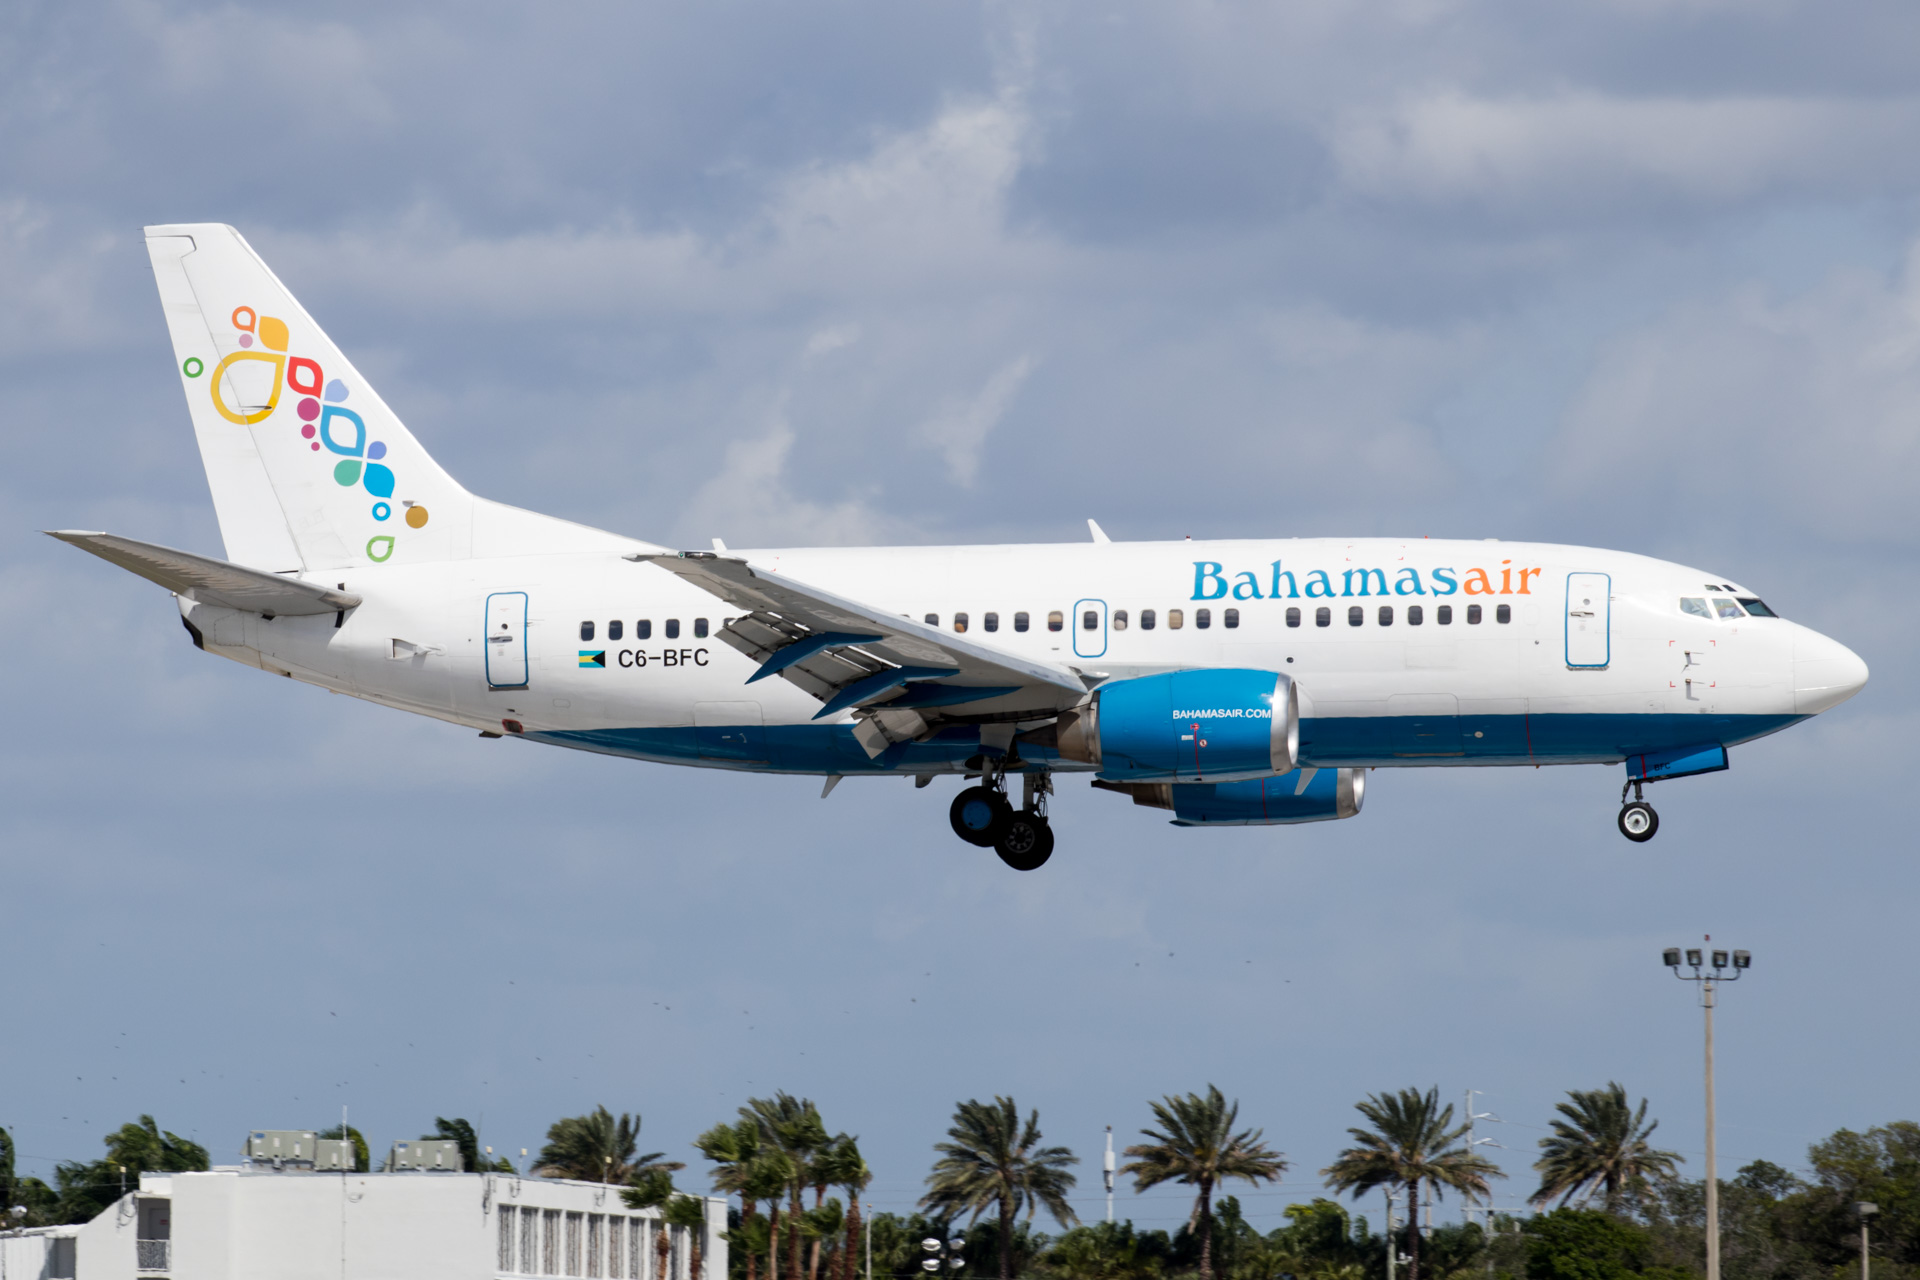 Bahamasair 737